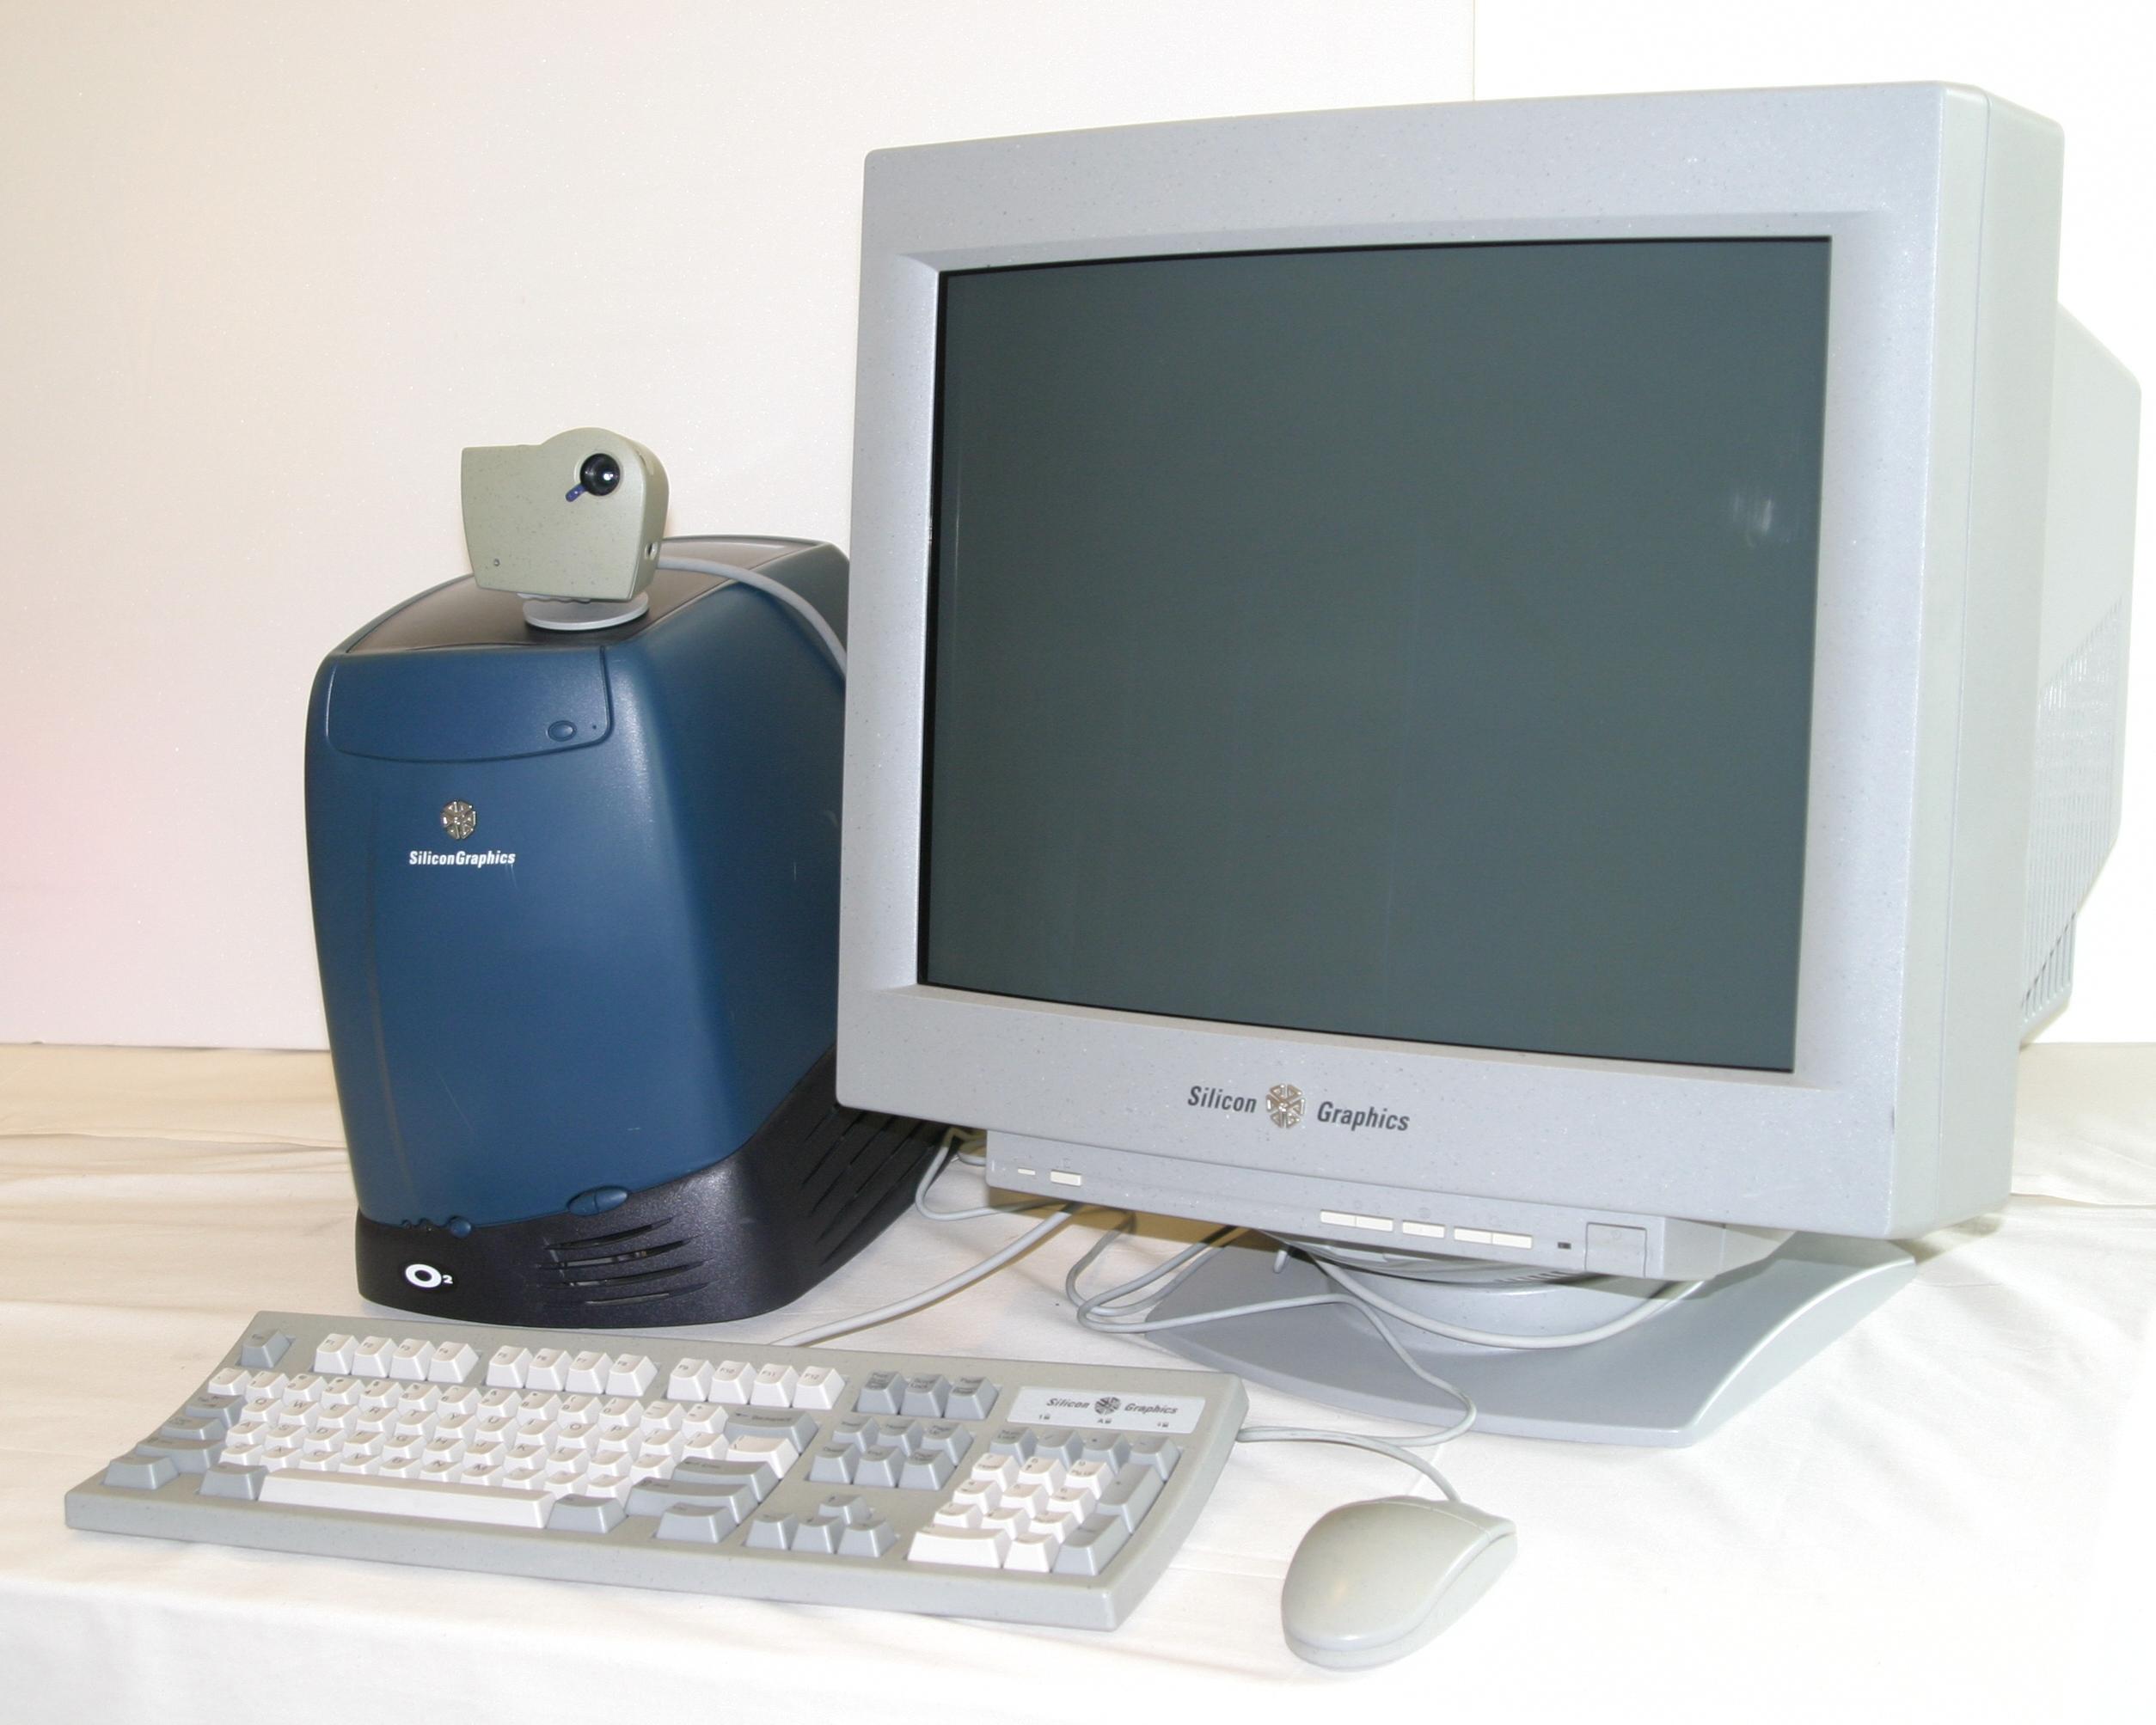 Sgi Personal Computers Kcg Computer Museum Satellite